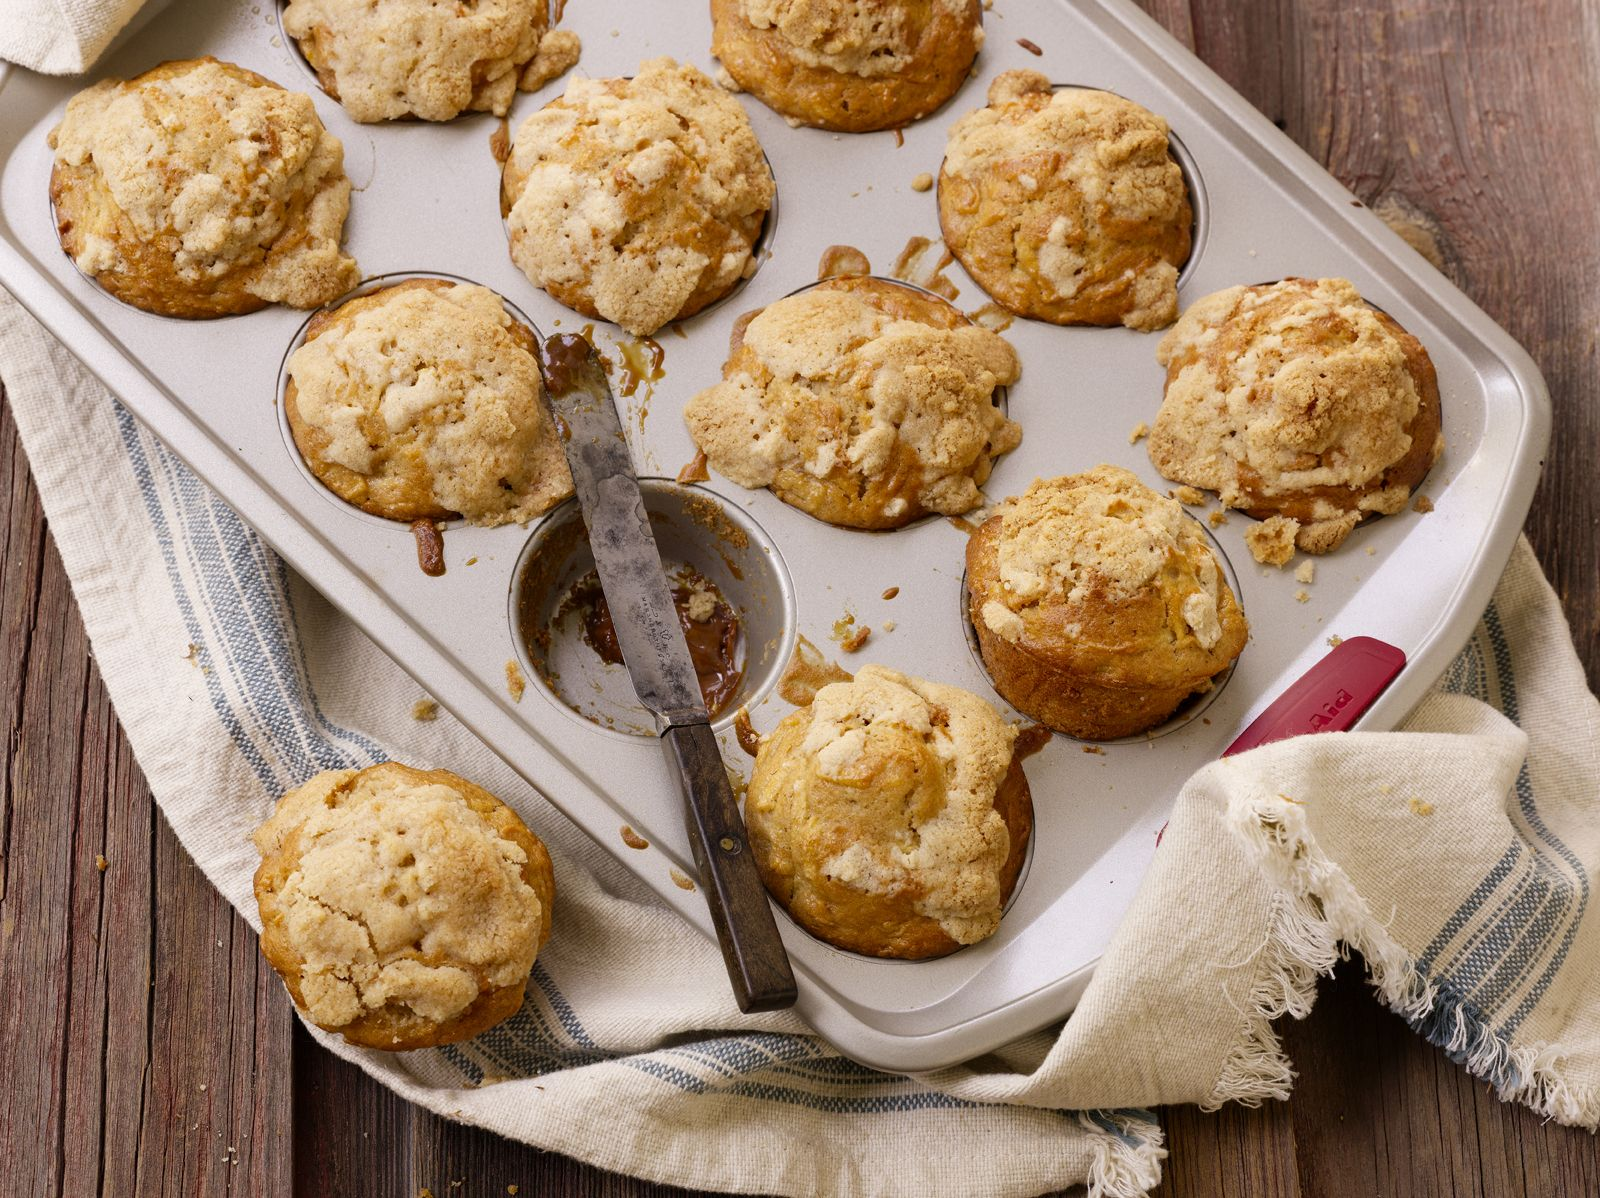 Apple cinnamon muffins caramel centers food photo david